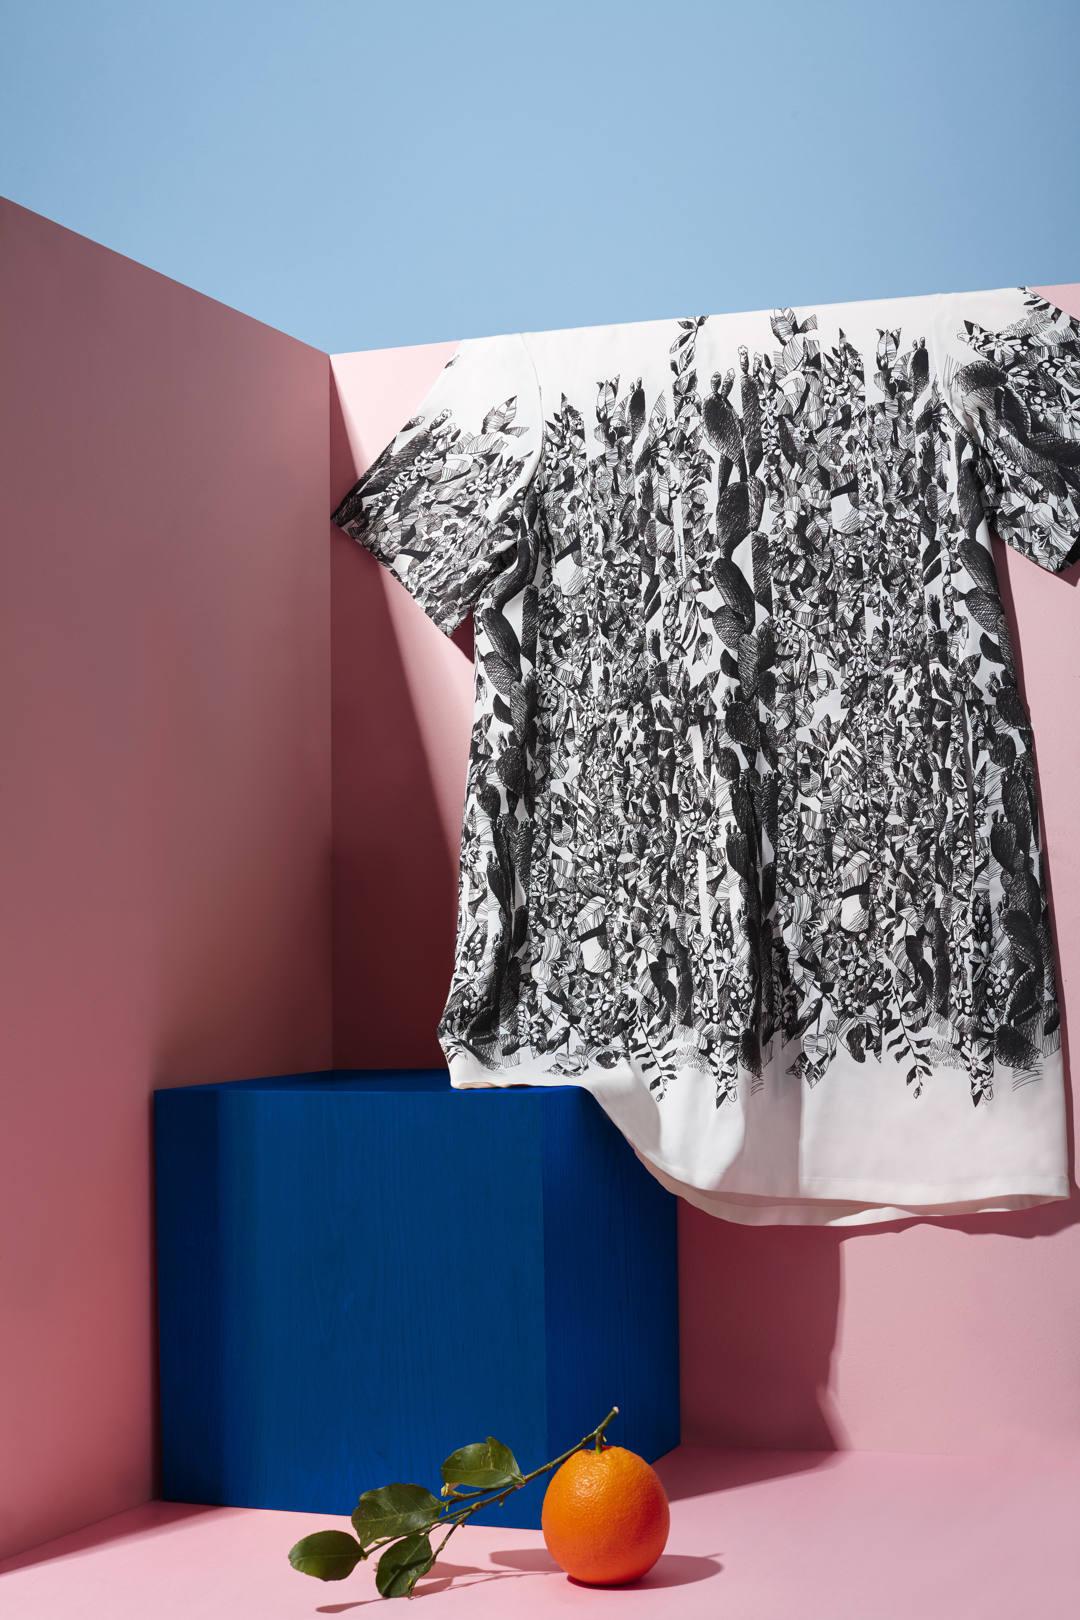 Orange Fiber, moda ecológica, Salvatore Ferragamo, Ferragamo, moda sostenible de Ferragamo, moda de lujo ecológica, moda ecológica Ferragamo, colección cápsula Ferragamo